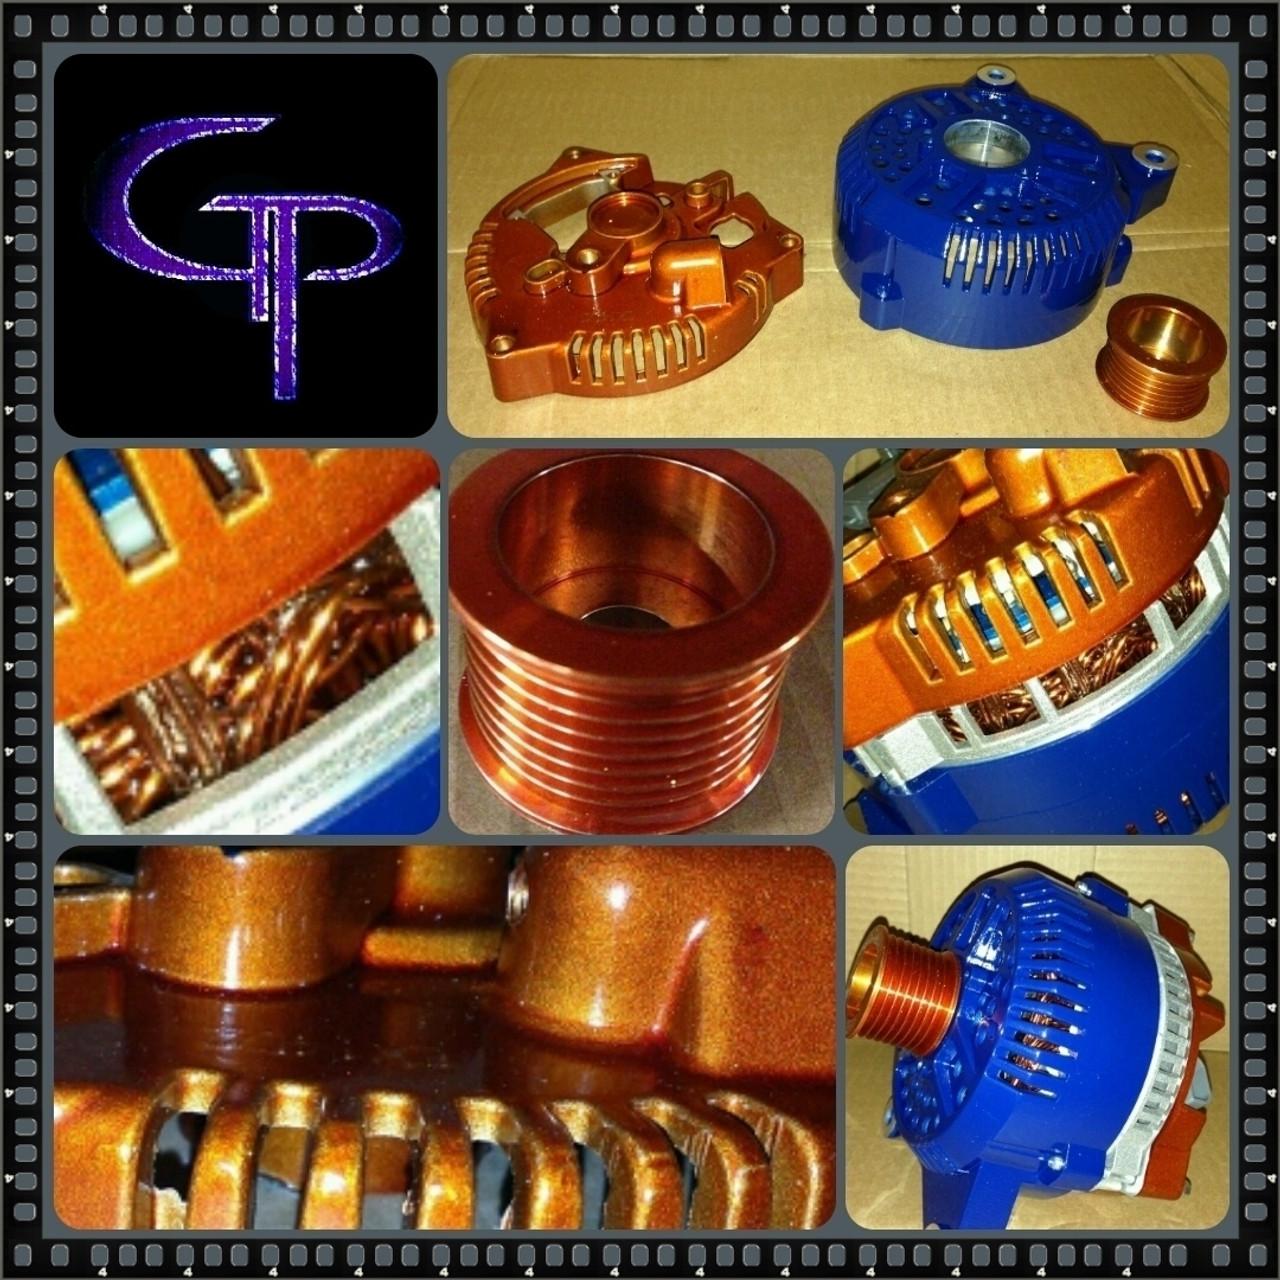 FORD MUSTANG 3.7L, 5.0L, 5.8L, -2014- 300AMP TEAM GP Alternator